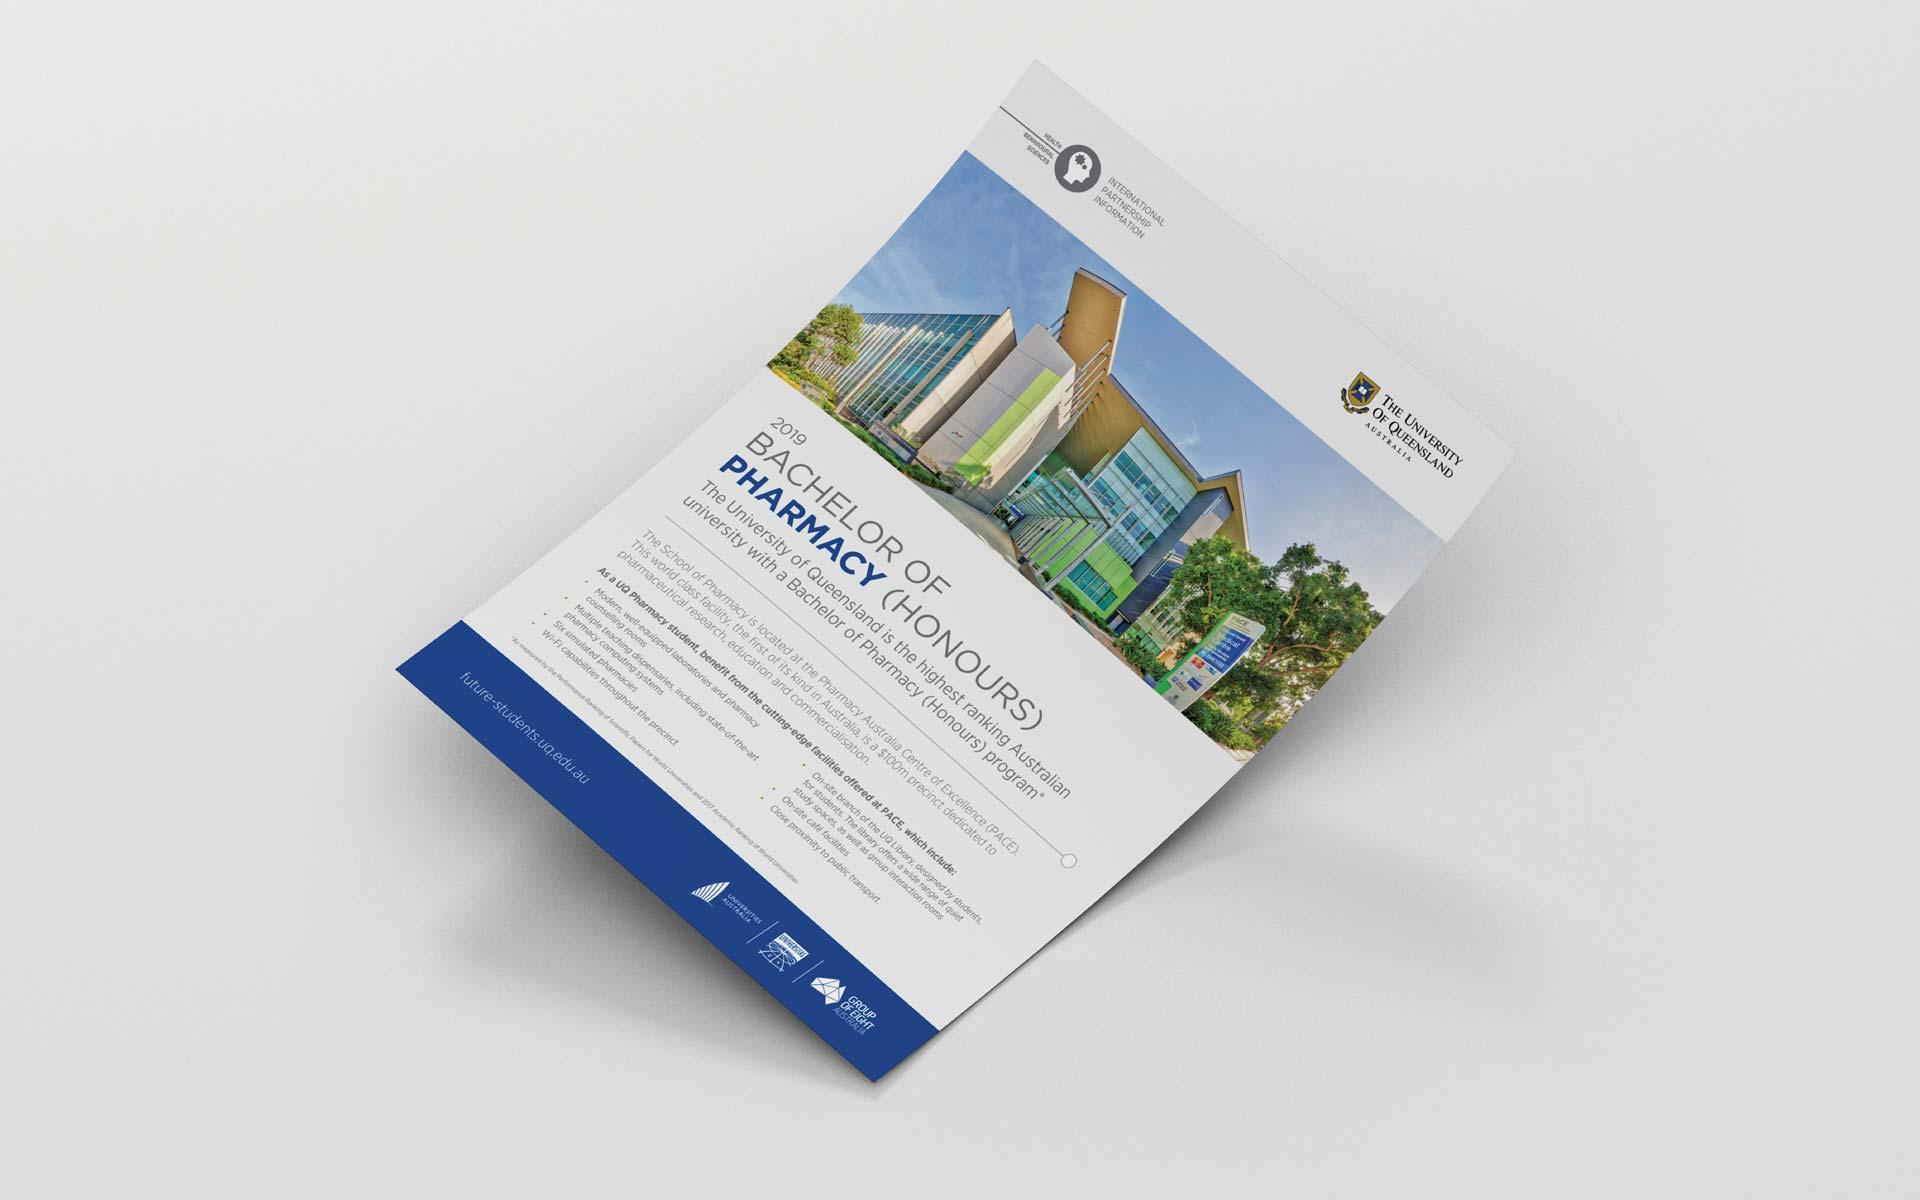 UQ Infographic Design Fact Sheet Design